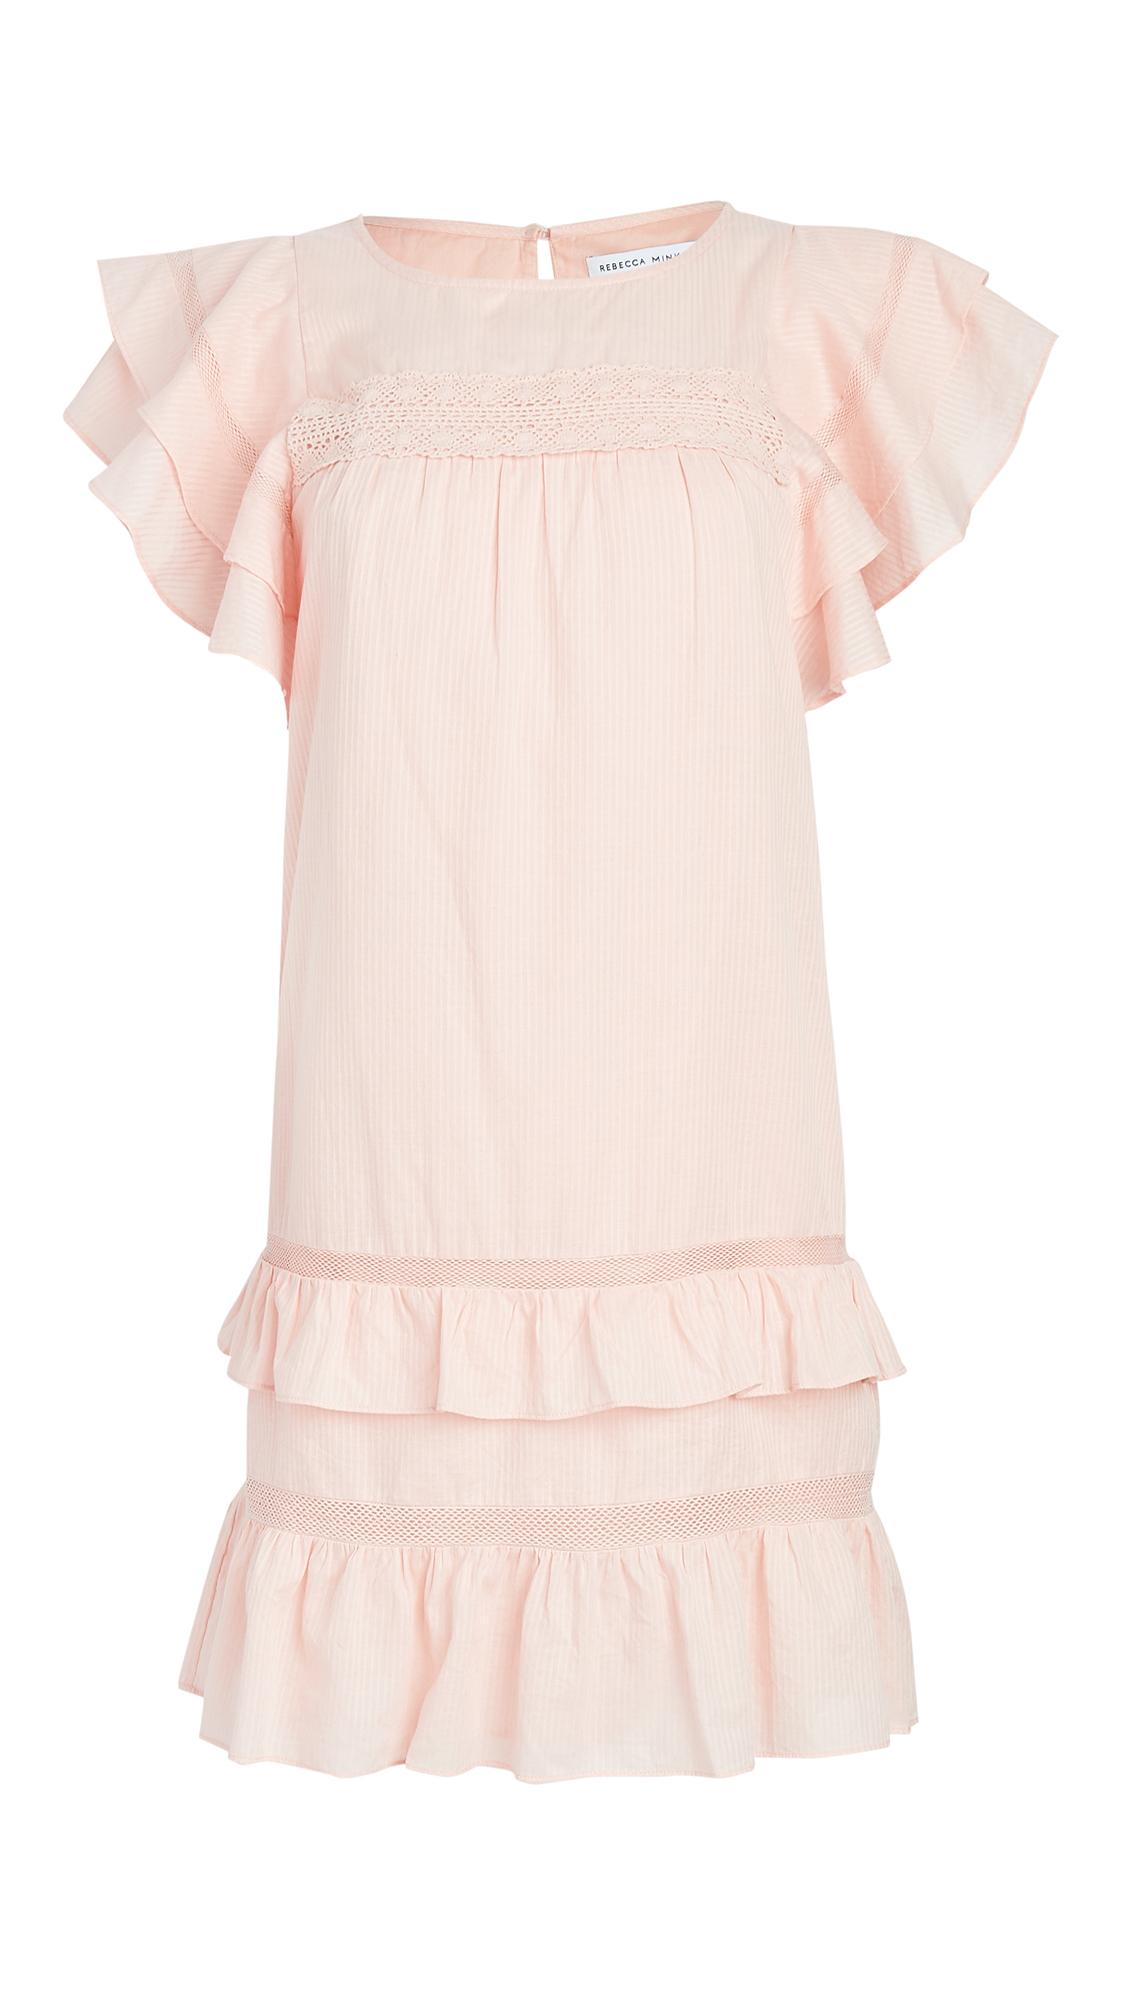 Rebecca Minkoff ILANA DRESS